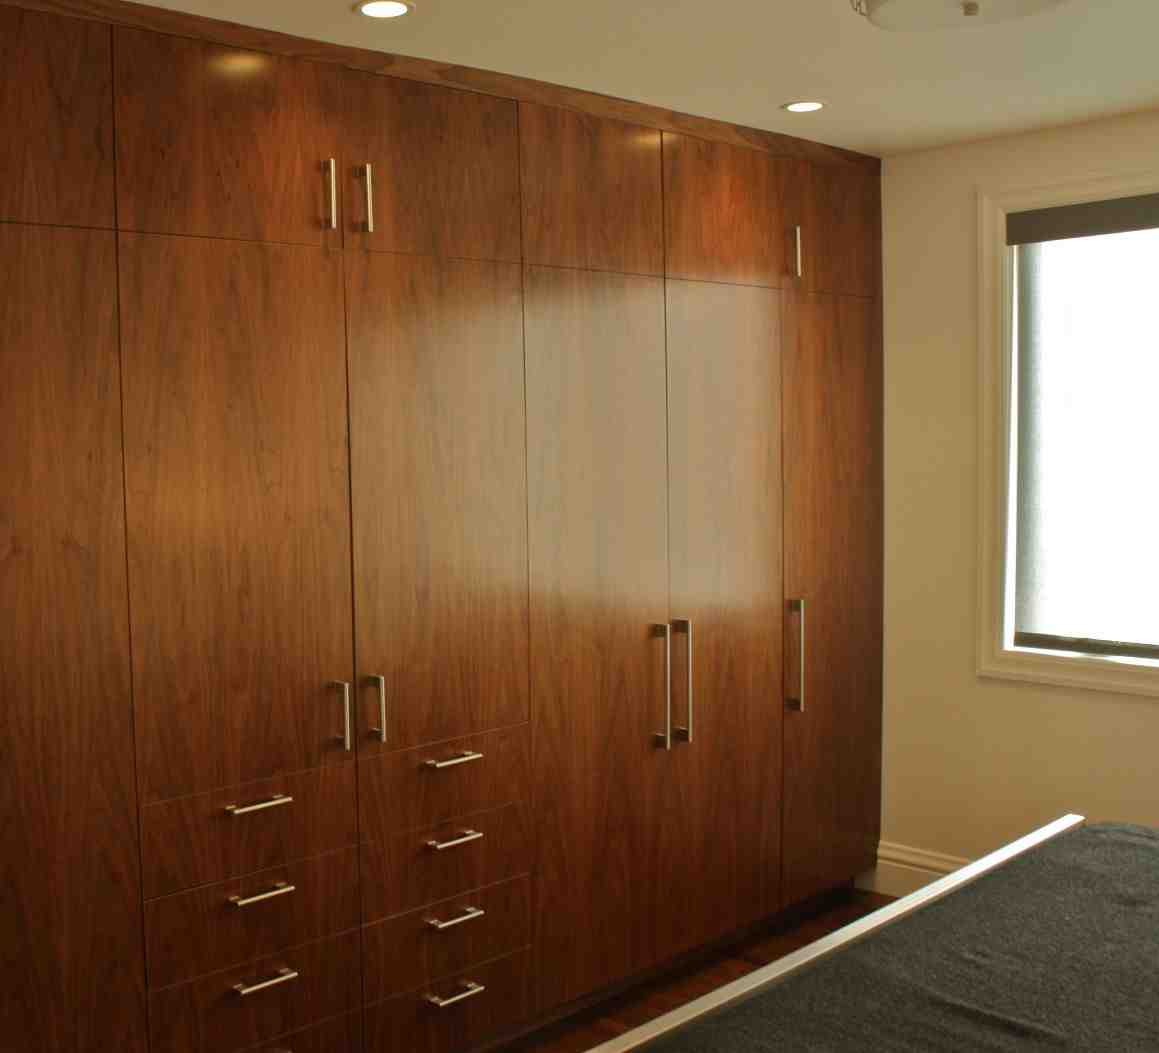 Bathroom Bench Ideas Floor To Ceiling Storage Cabinets Home Furniture Design